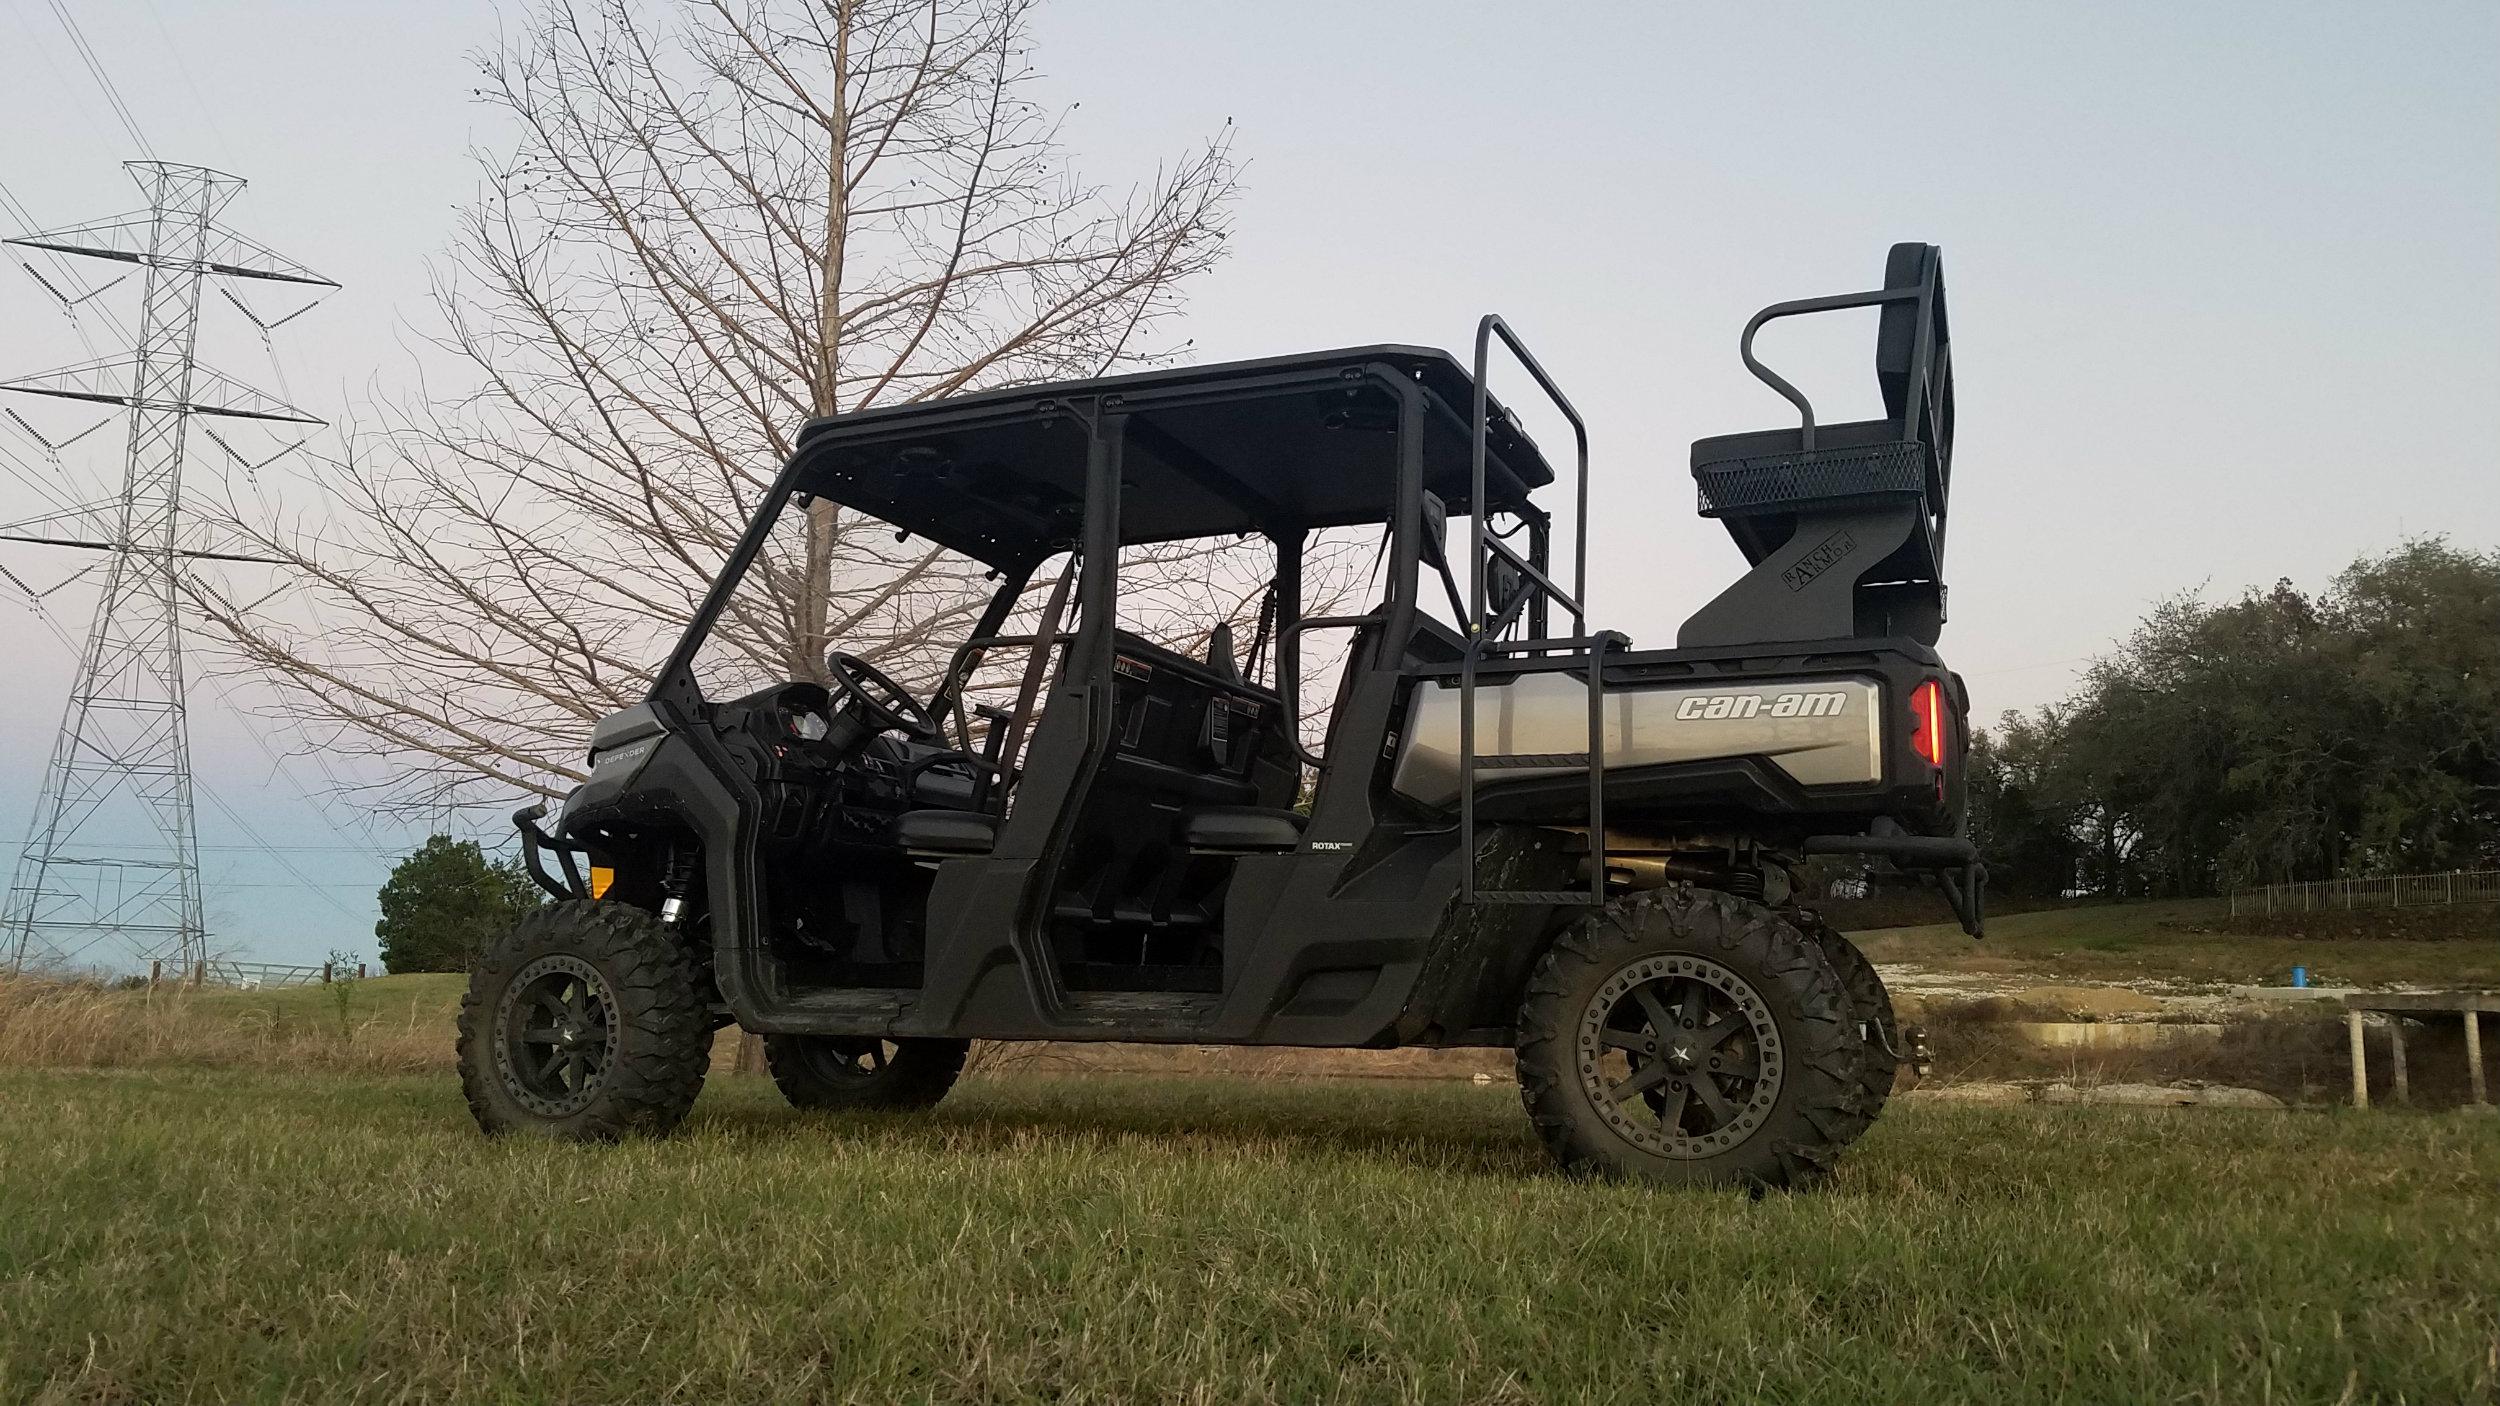 canam-defender-high-seat-hunting-rack.jpg